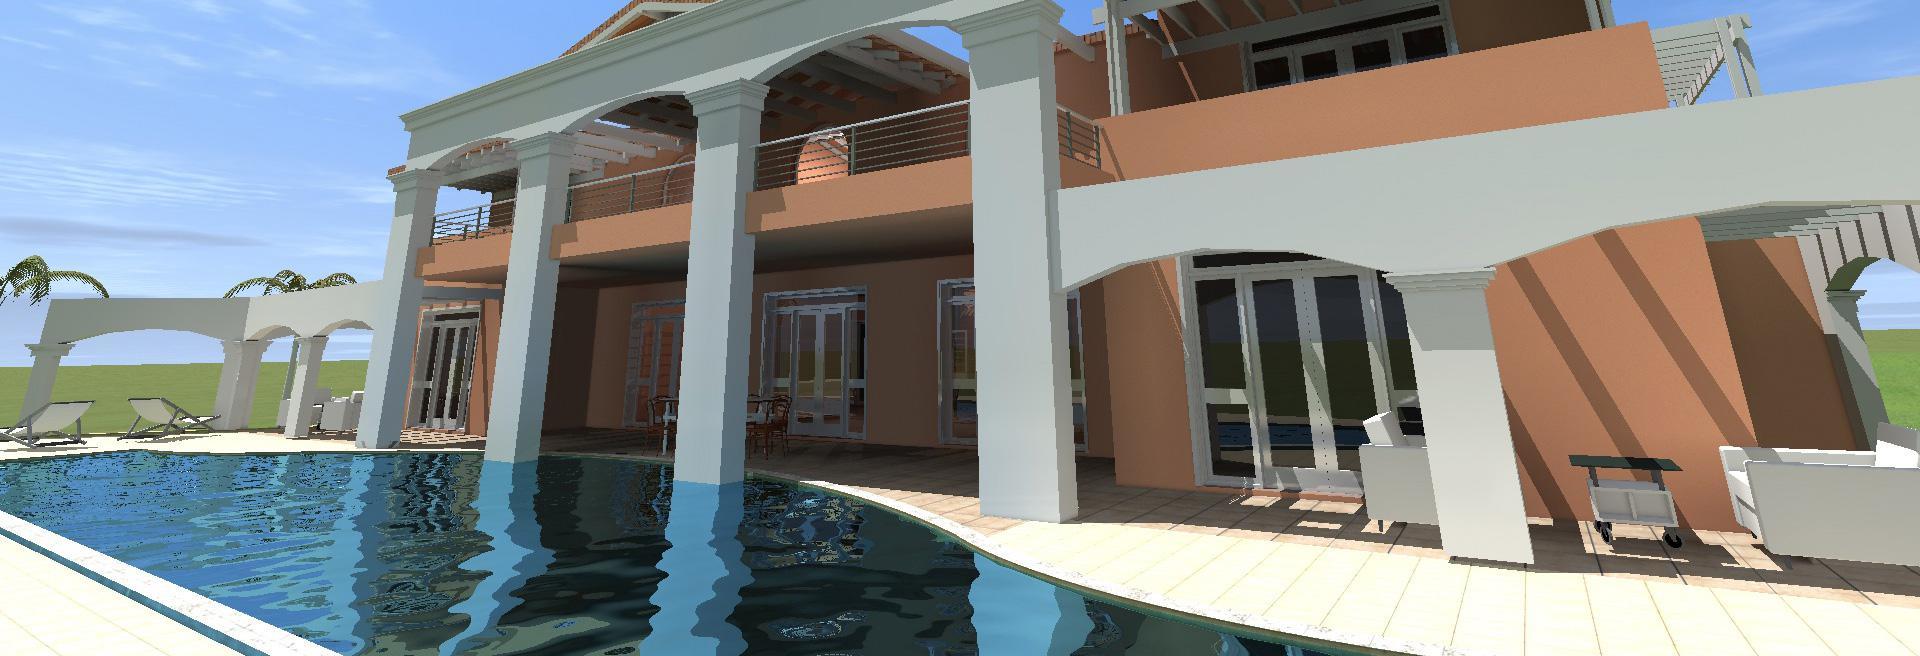 Terrain Guana Bay Lot#10 St.Maarten - Golden Coast Real Estate